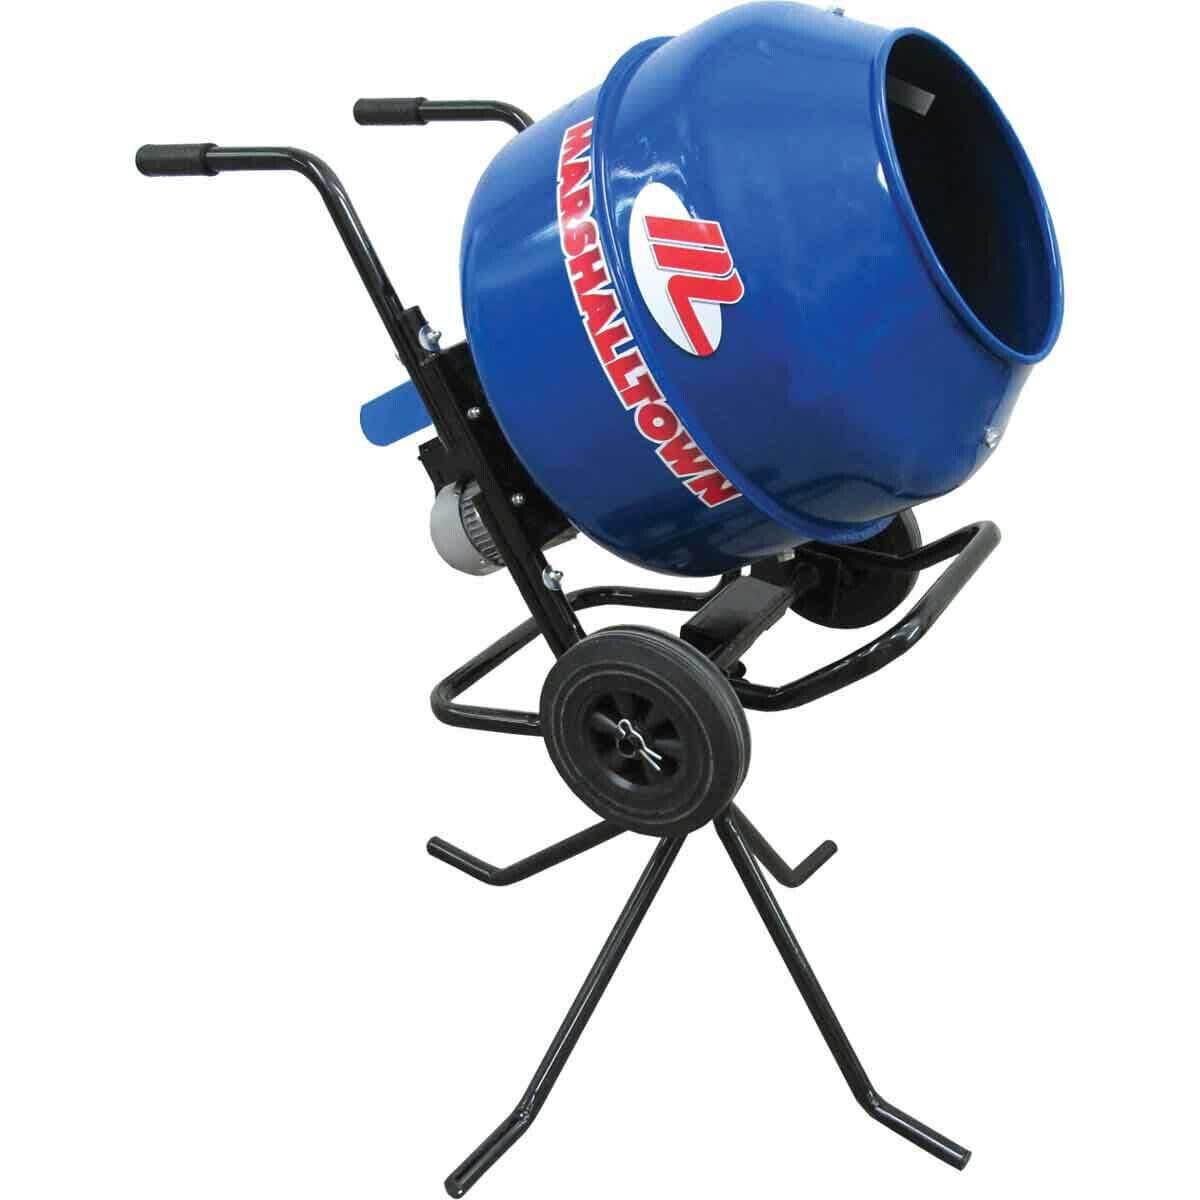 Marshalltown Portable Mixer Stand